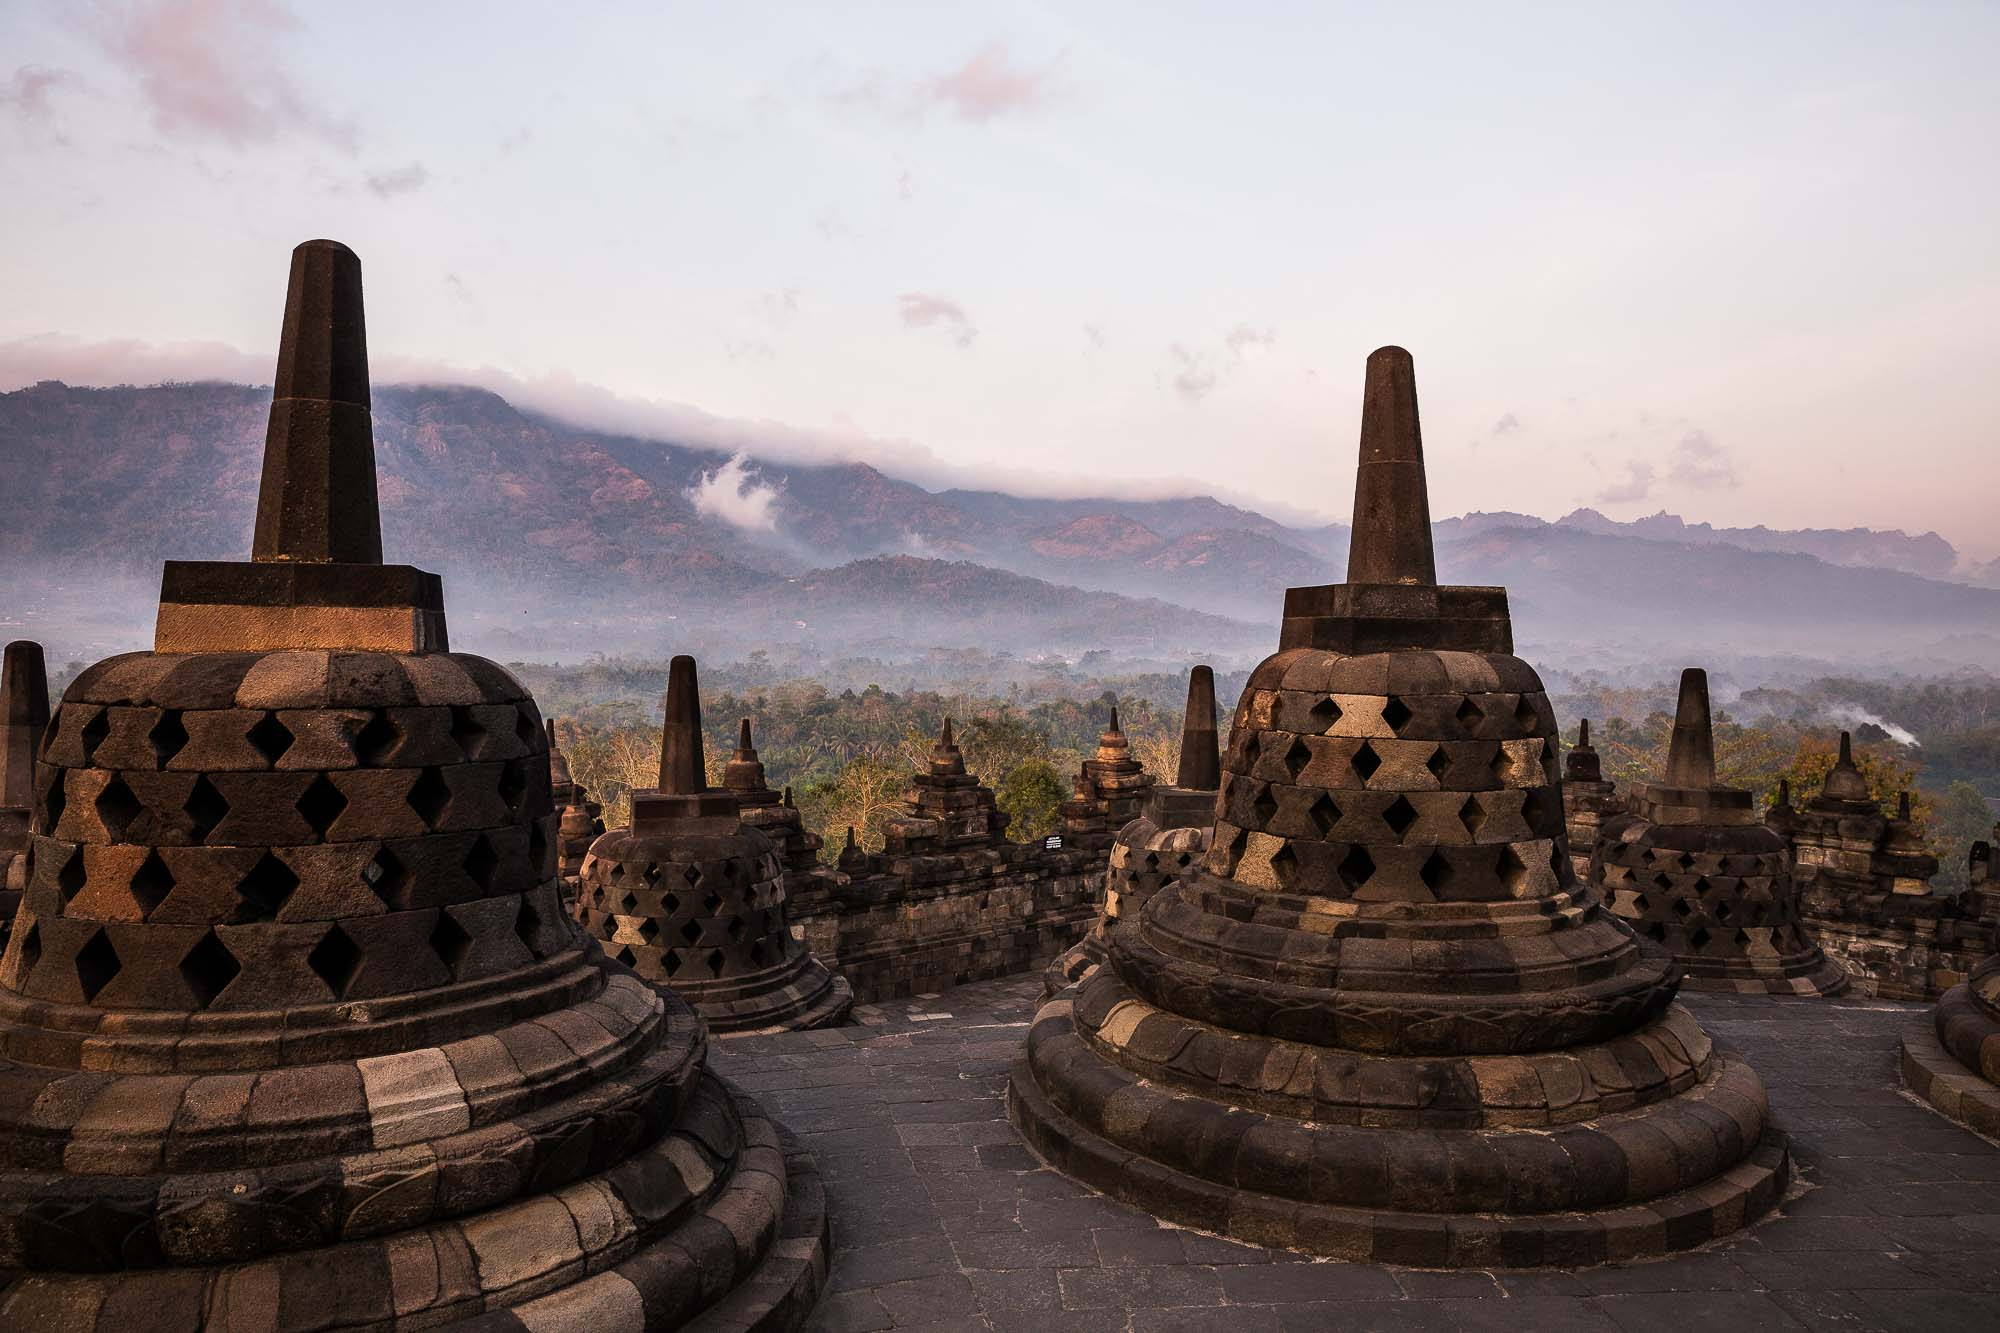 INDONESIA_2015_02 BOROBODUR-PRAMBANAN-YOGYA_JusMedic_157